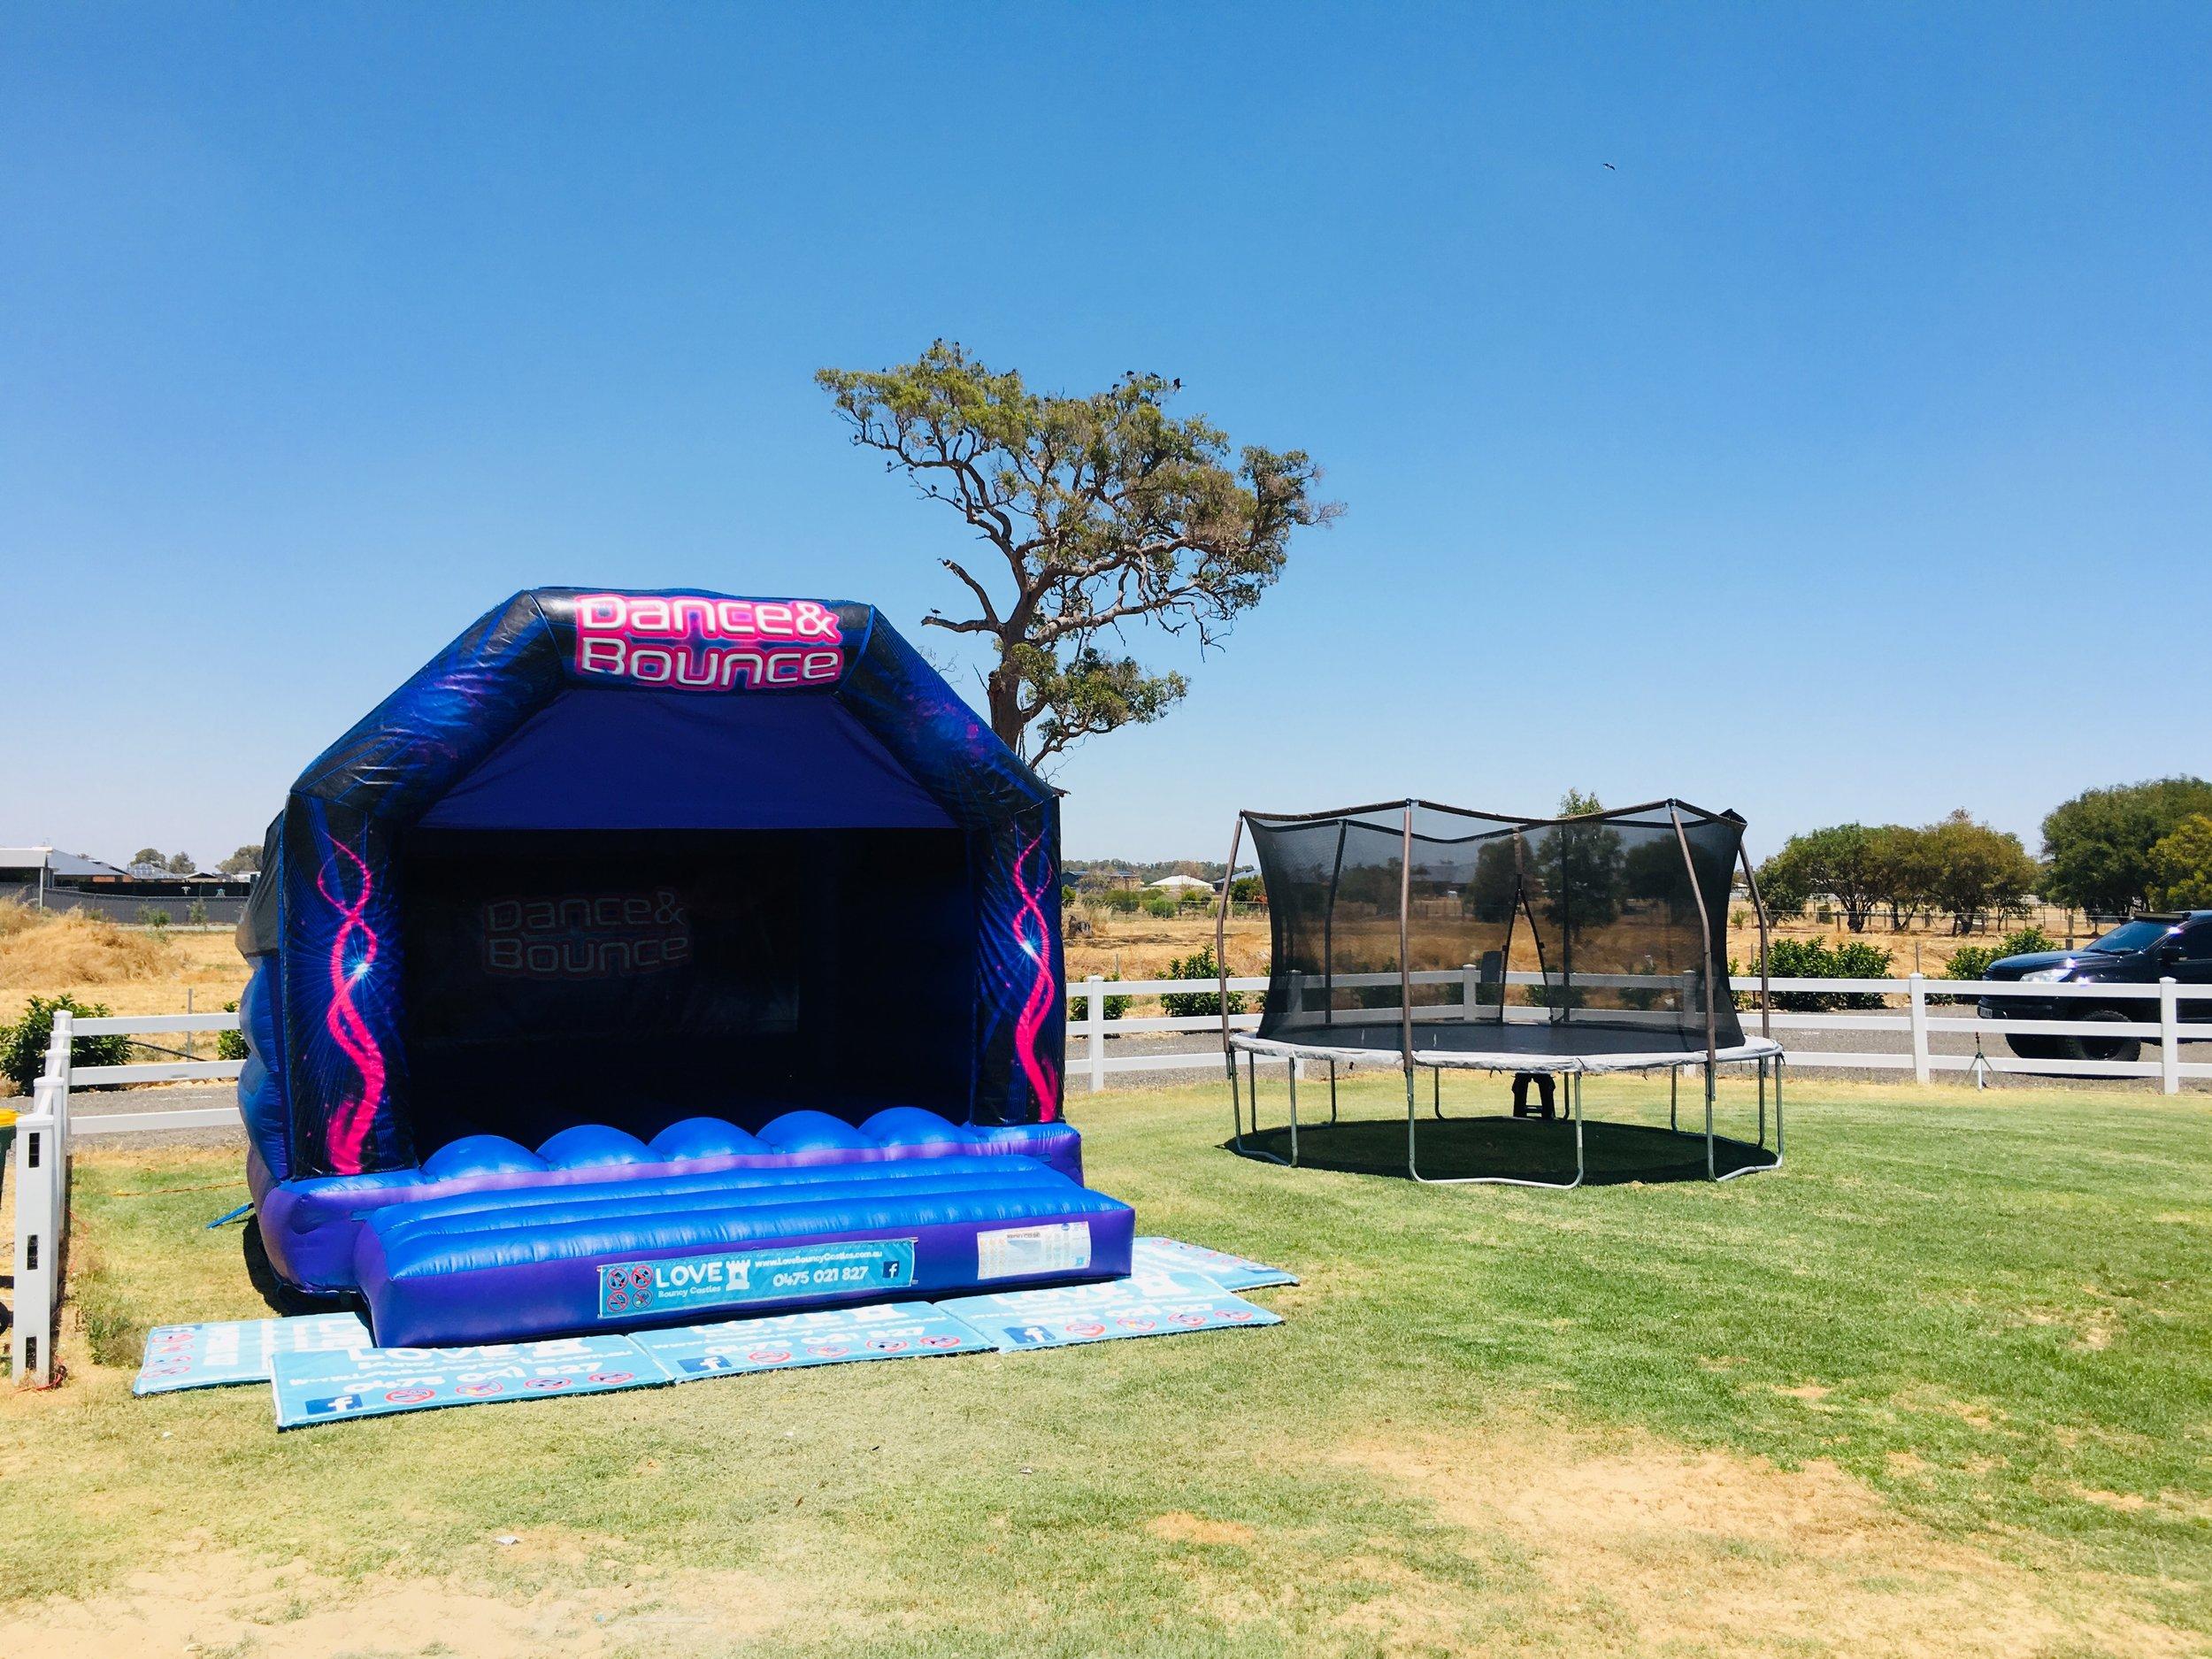 Adult Bouncy Castle Hire Perth- Love Bouncy Castles